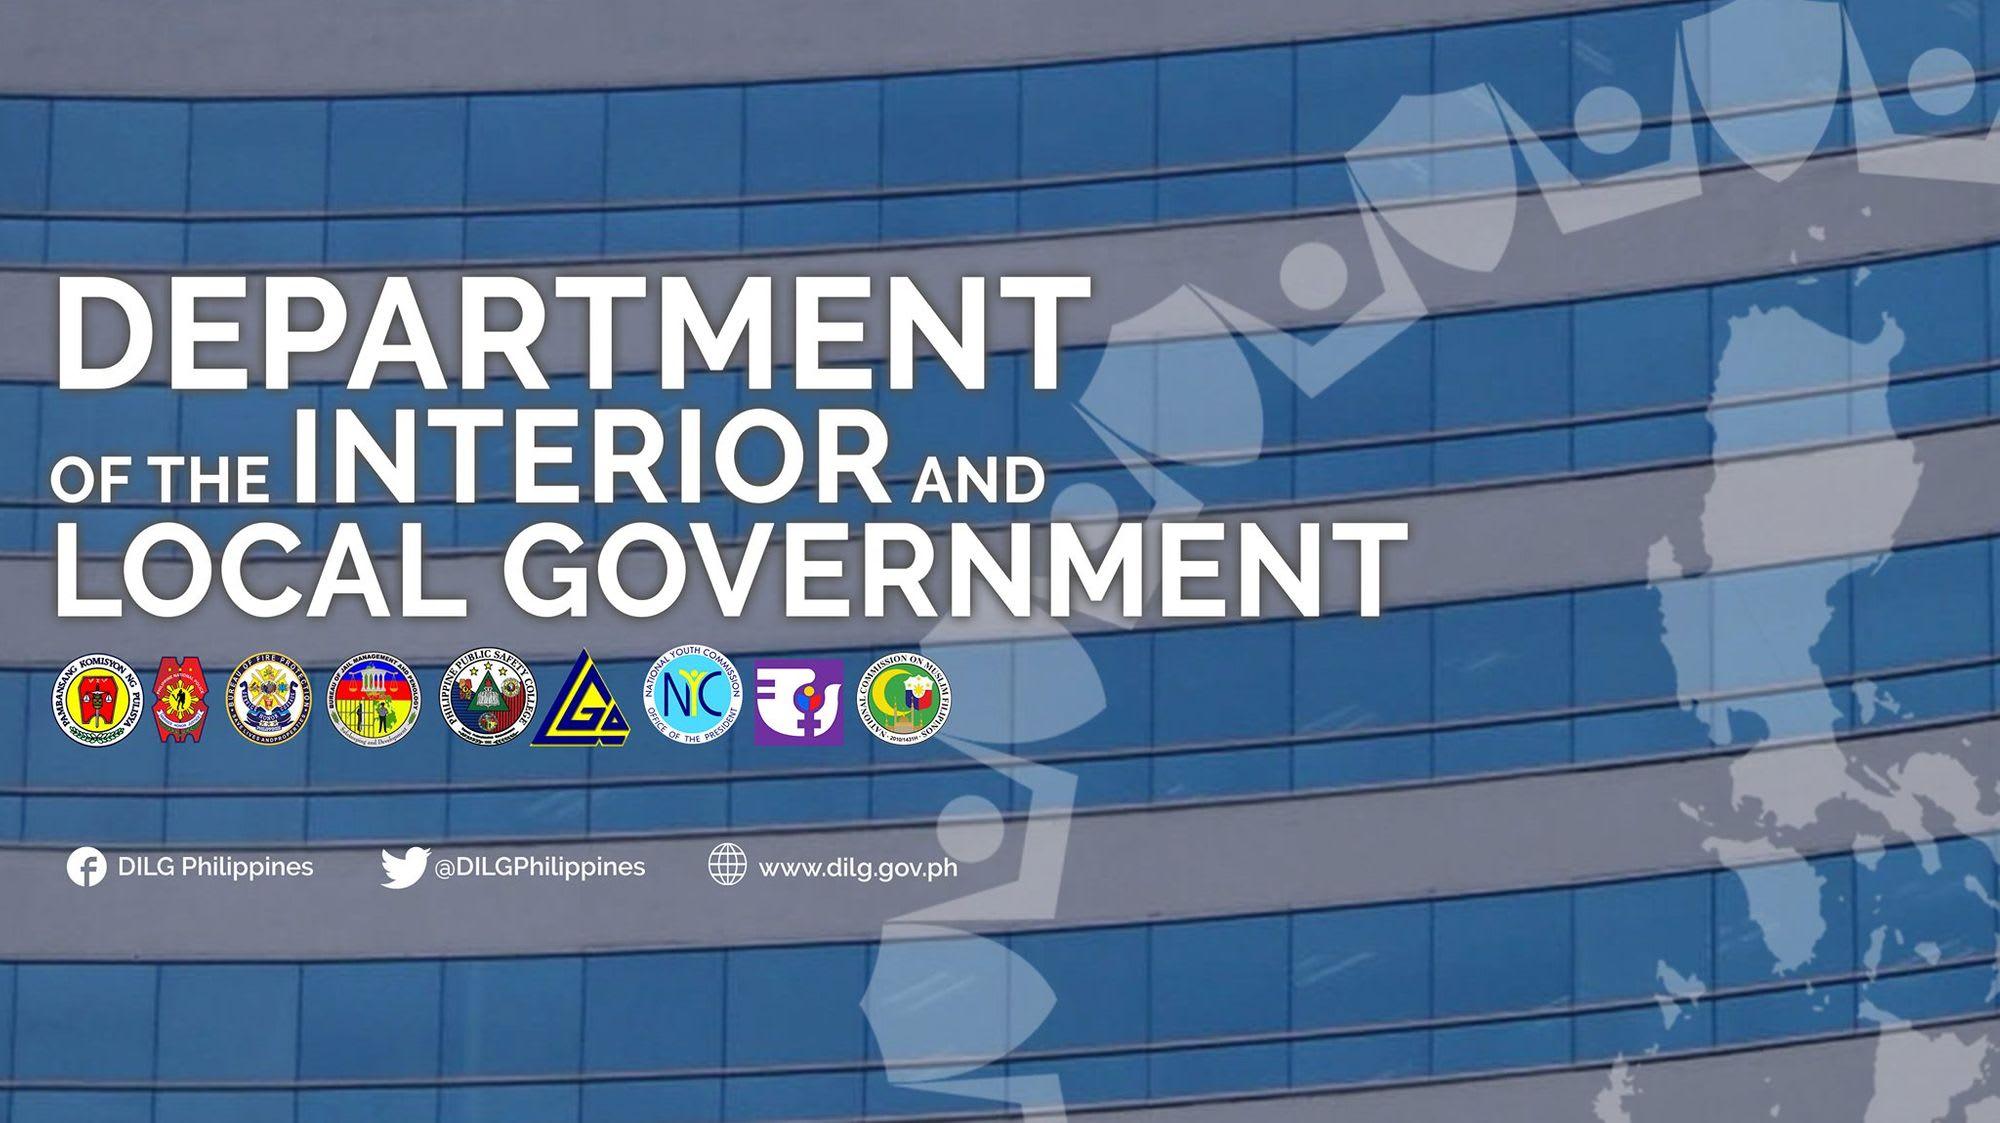 DILG will issue a Memorandum Circular to those non-compliant LGUs